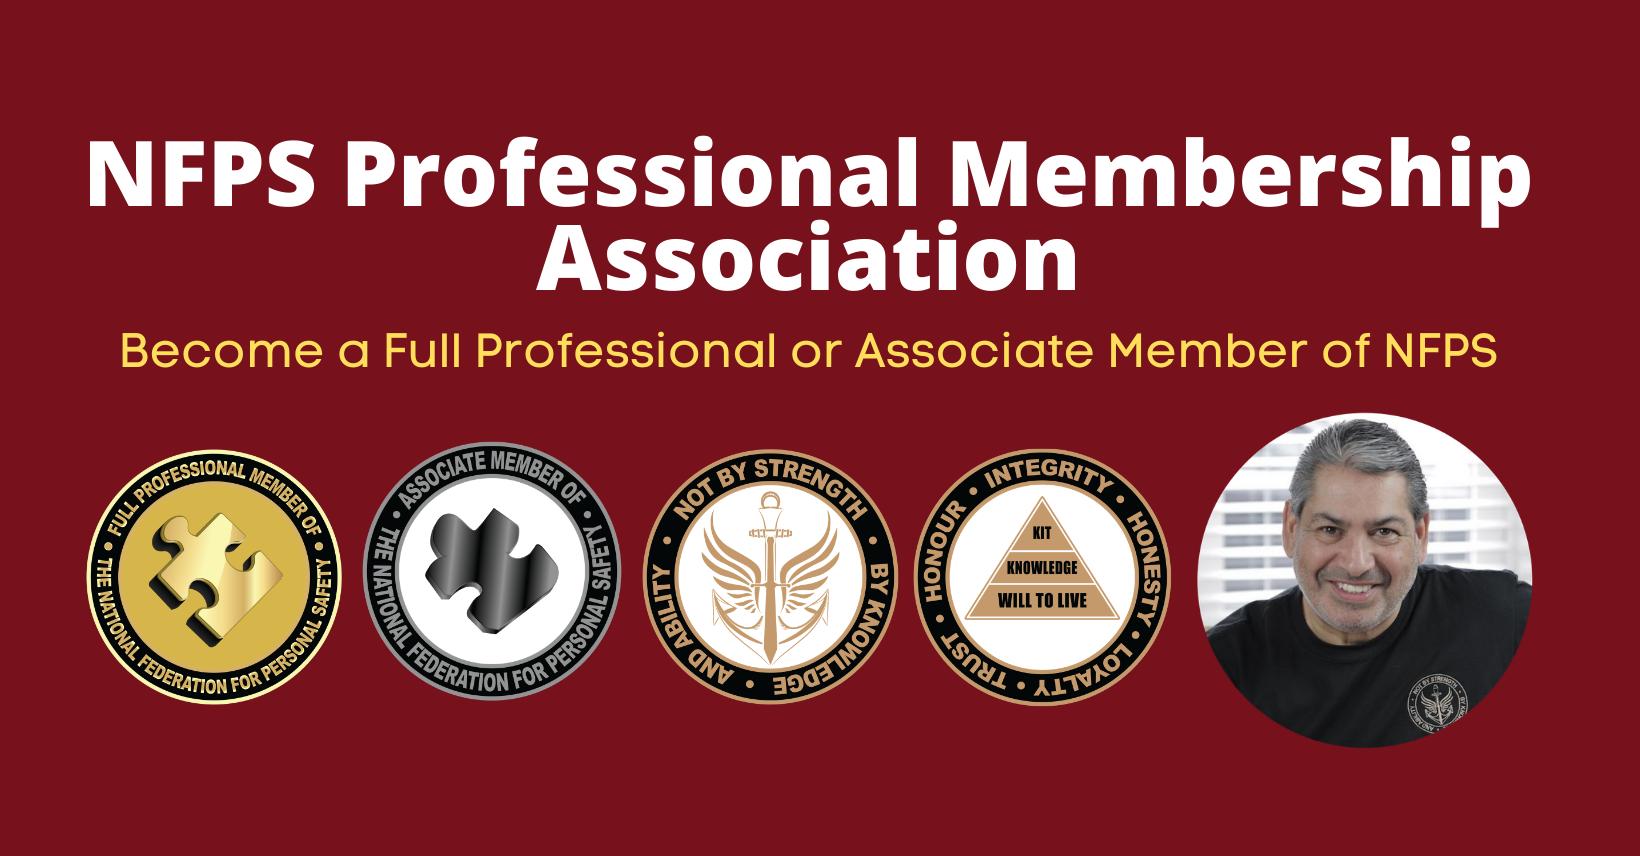 NFPS Professional Membership Association 2020